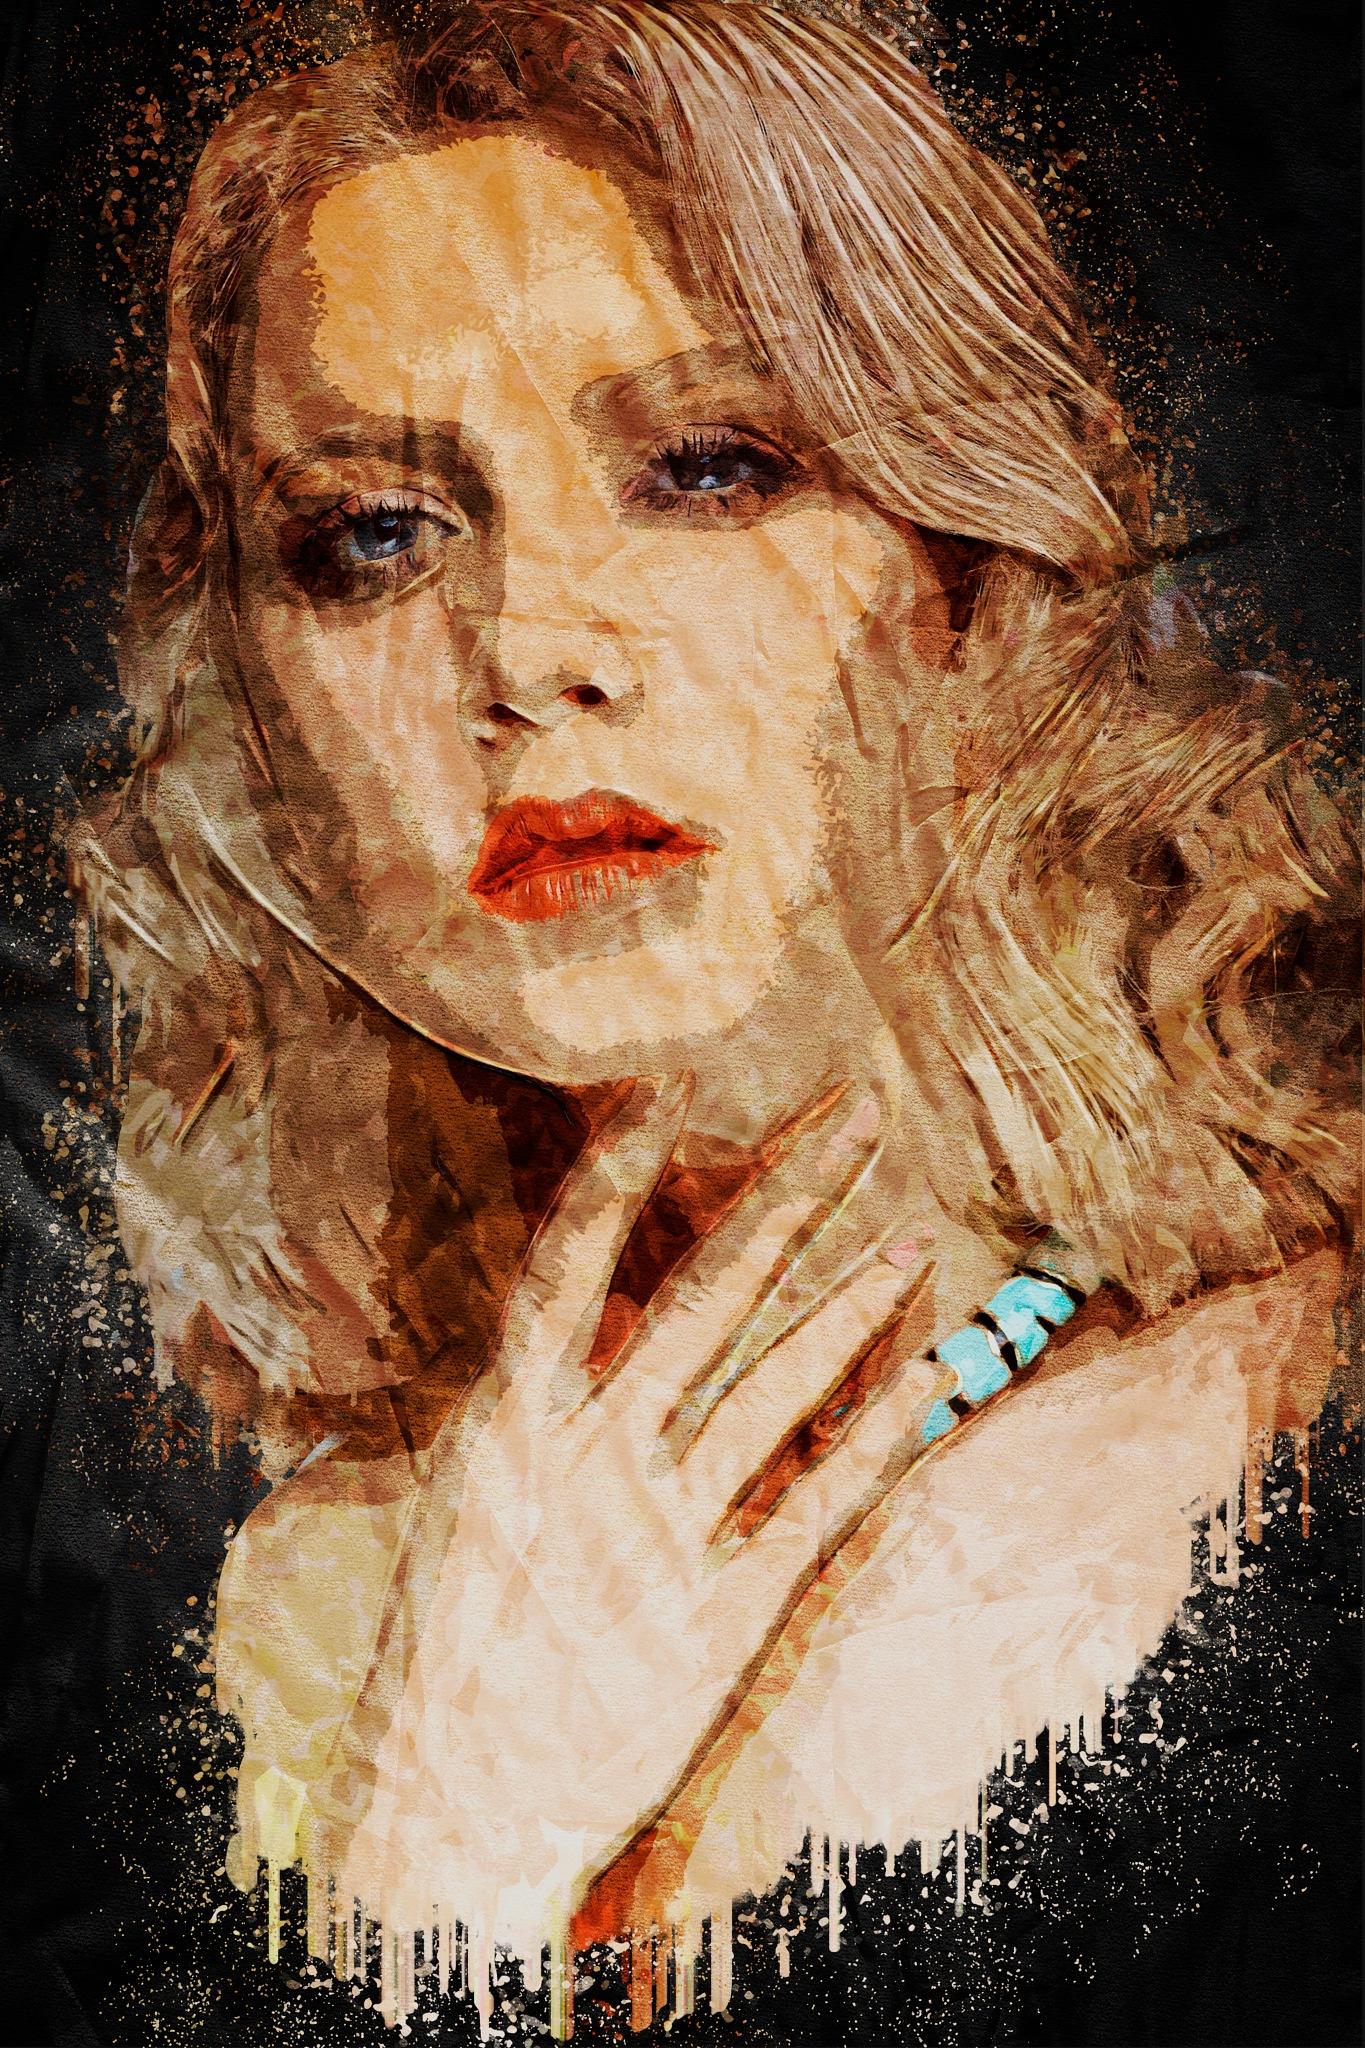 Acrylic Painting by Brigitte Werner